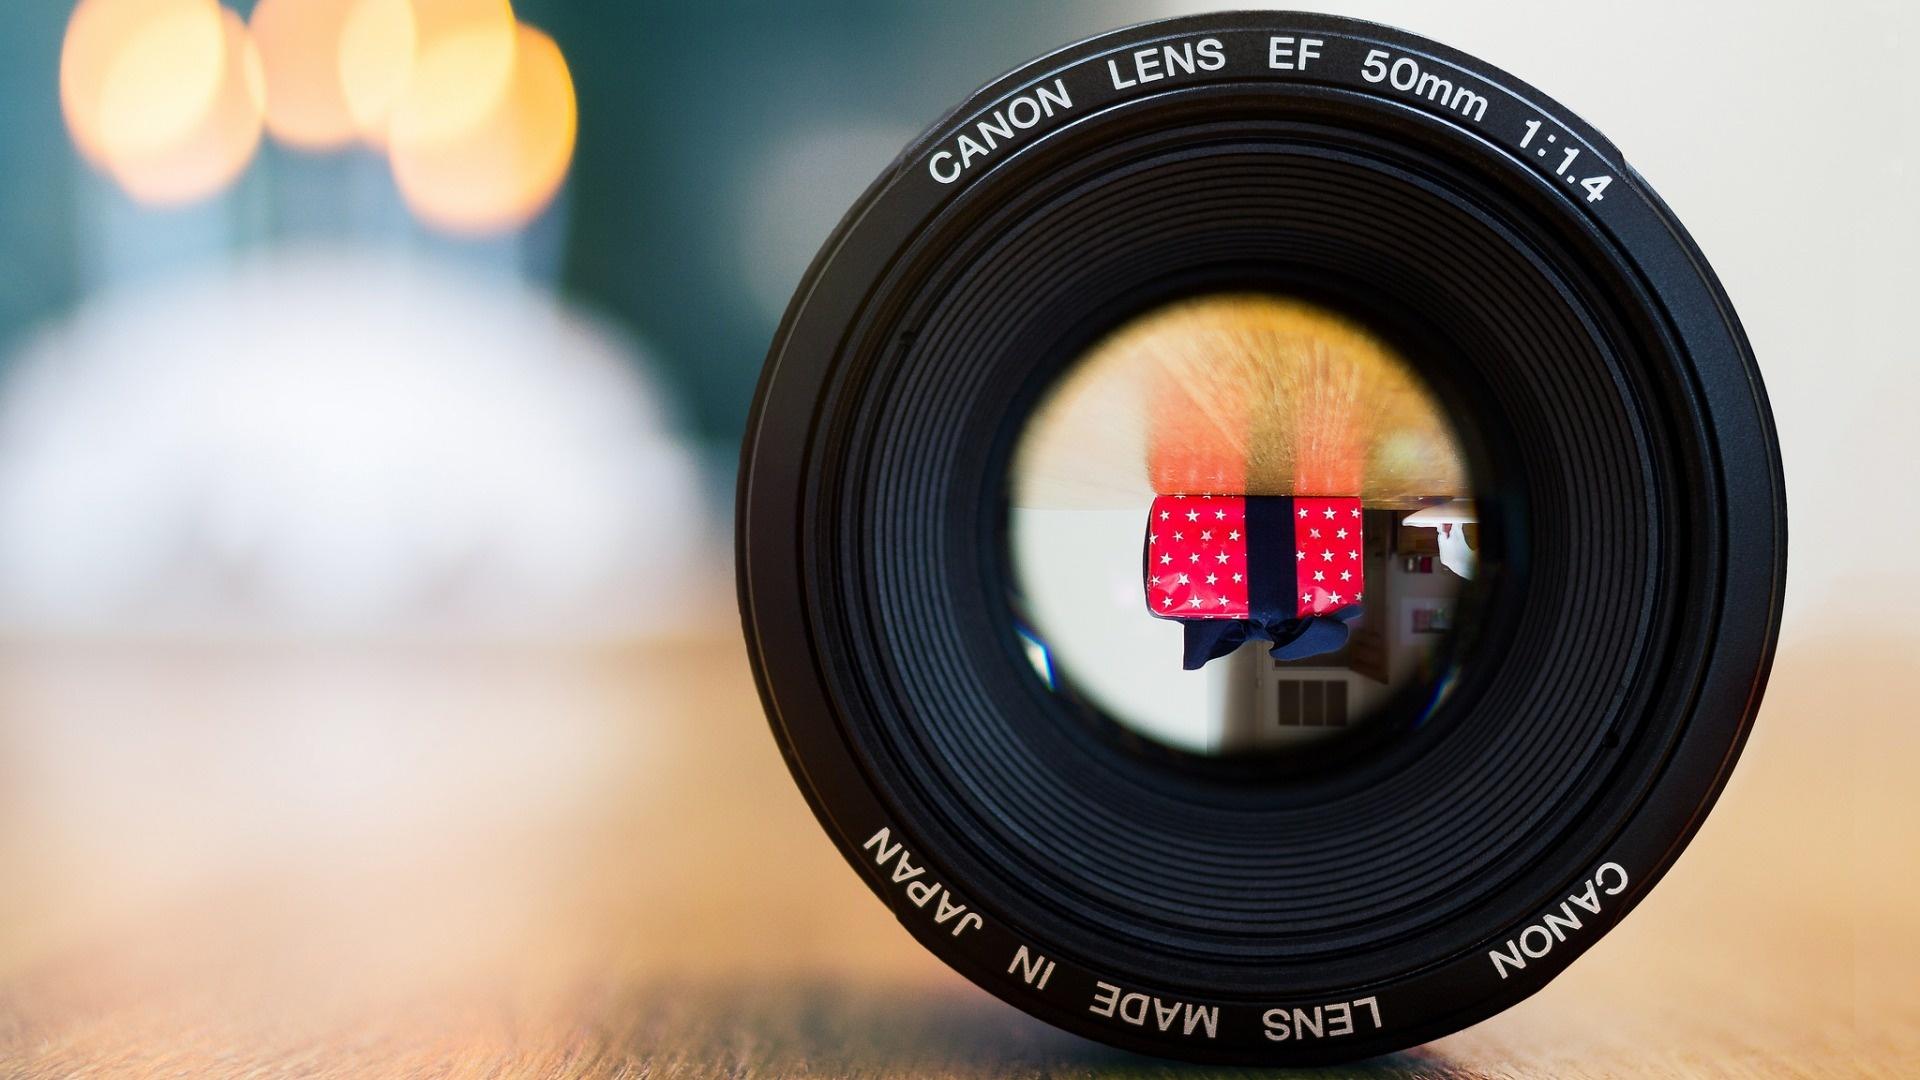 Canon Camera Lens 50mm Wallpaper   New HD Wallpapers 1920x1080